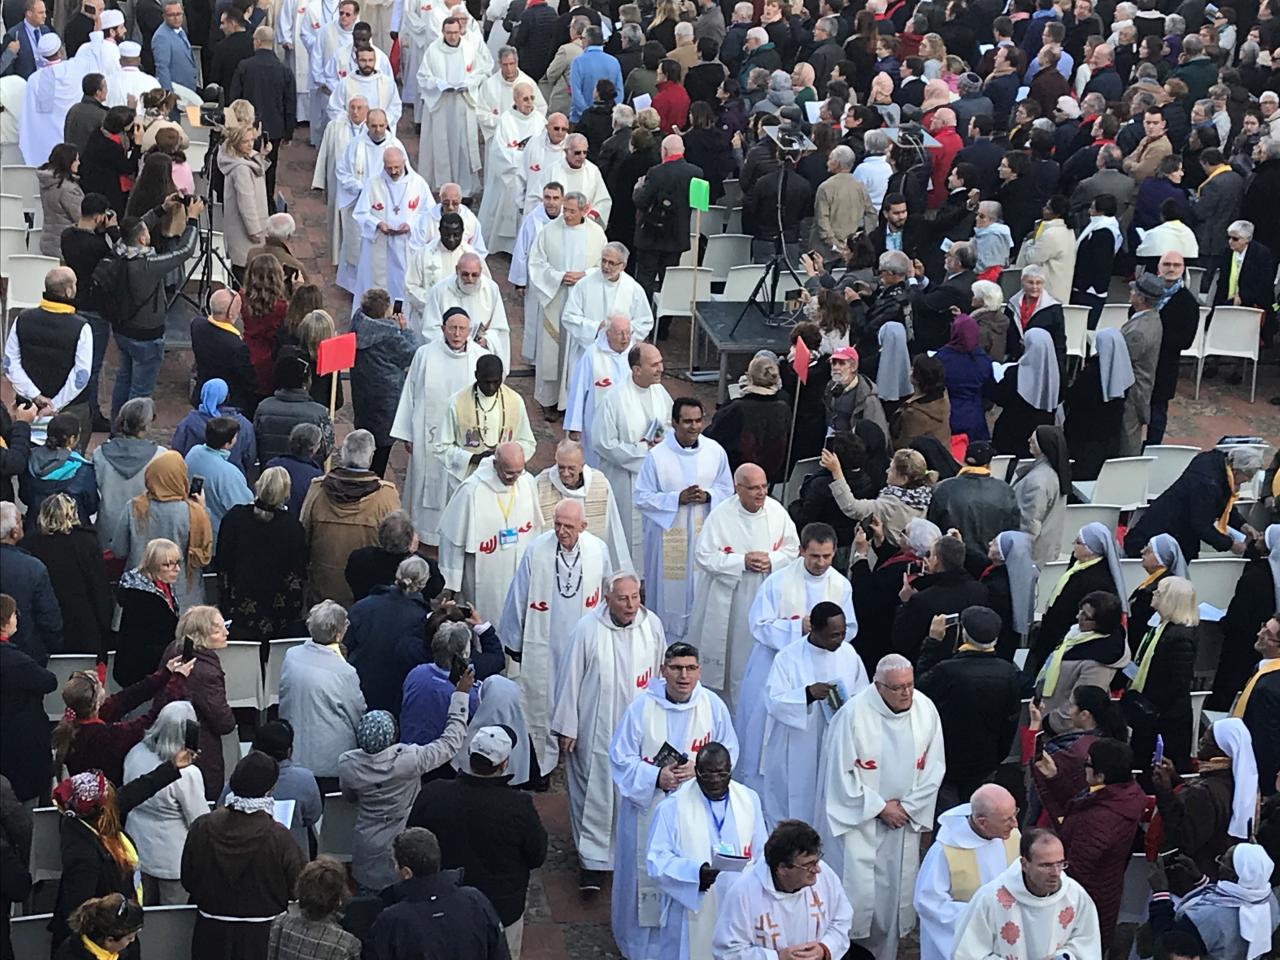 Catholic Church beatifies 19 Christians in Algeria